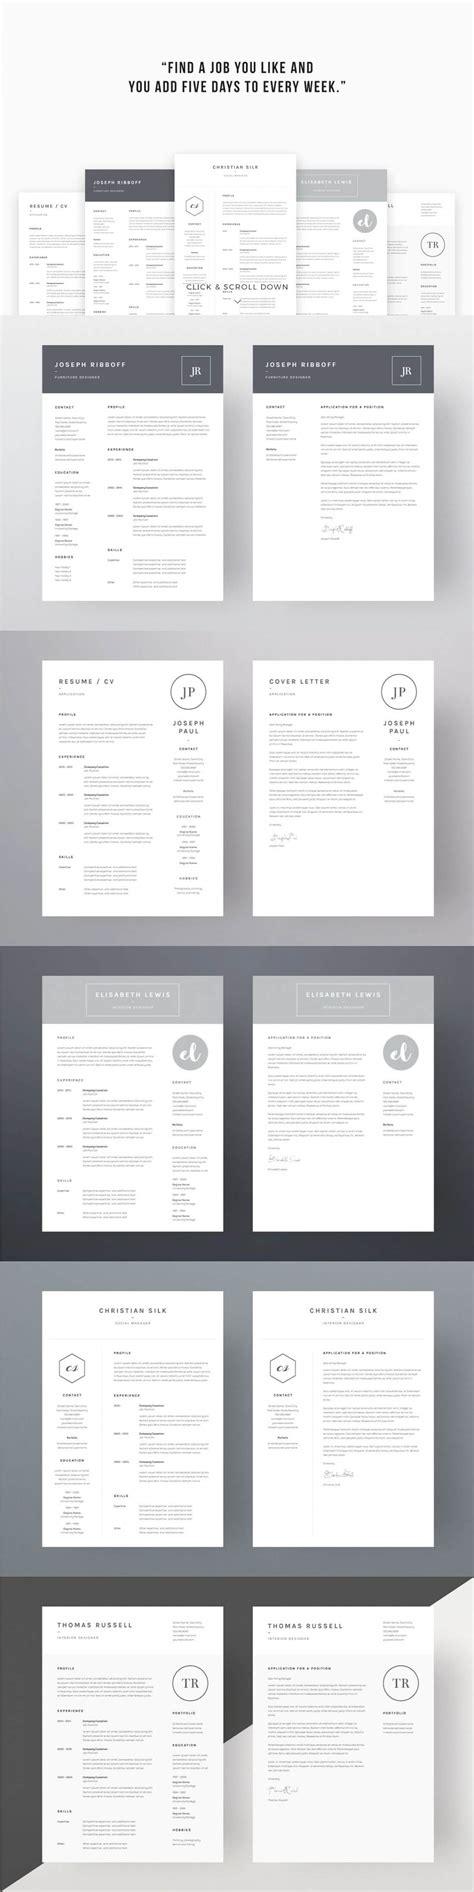 rbe graphics resource blogging 1 000 logo templates